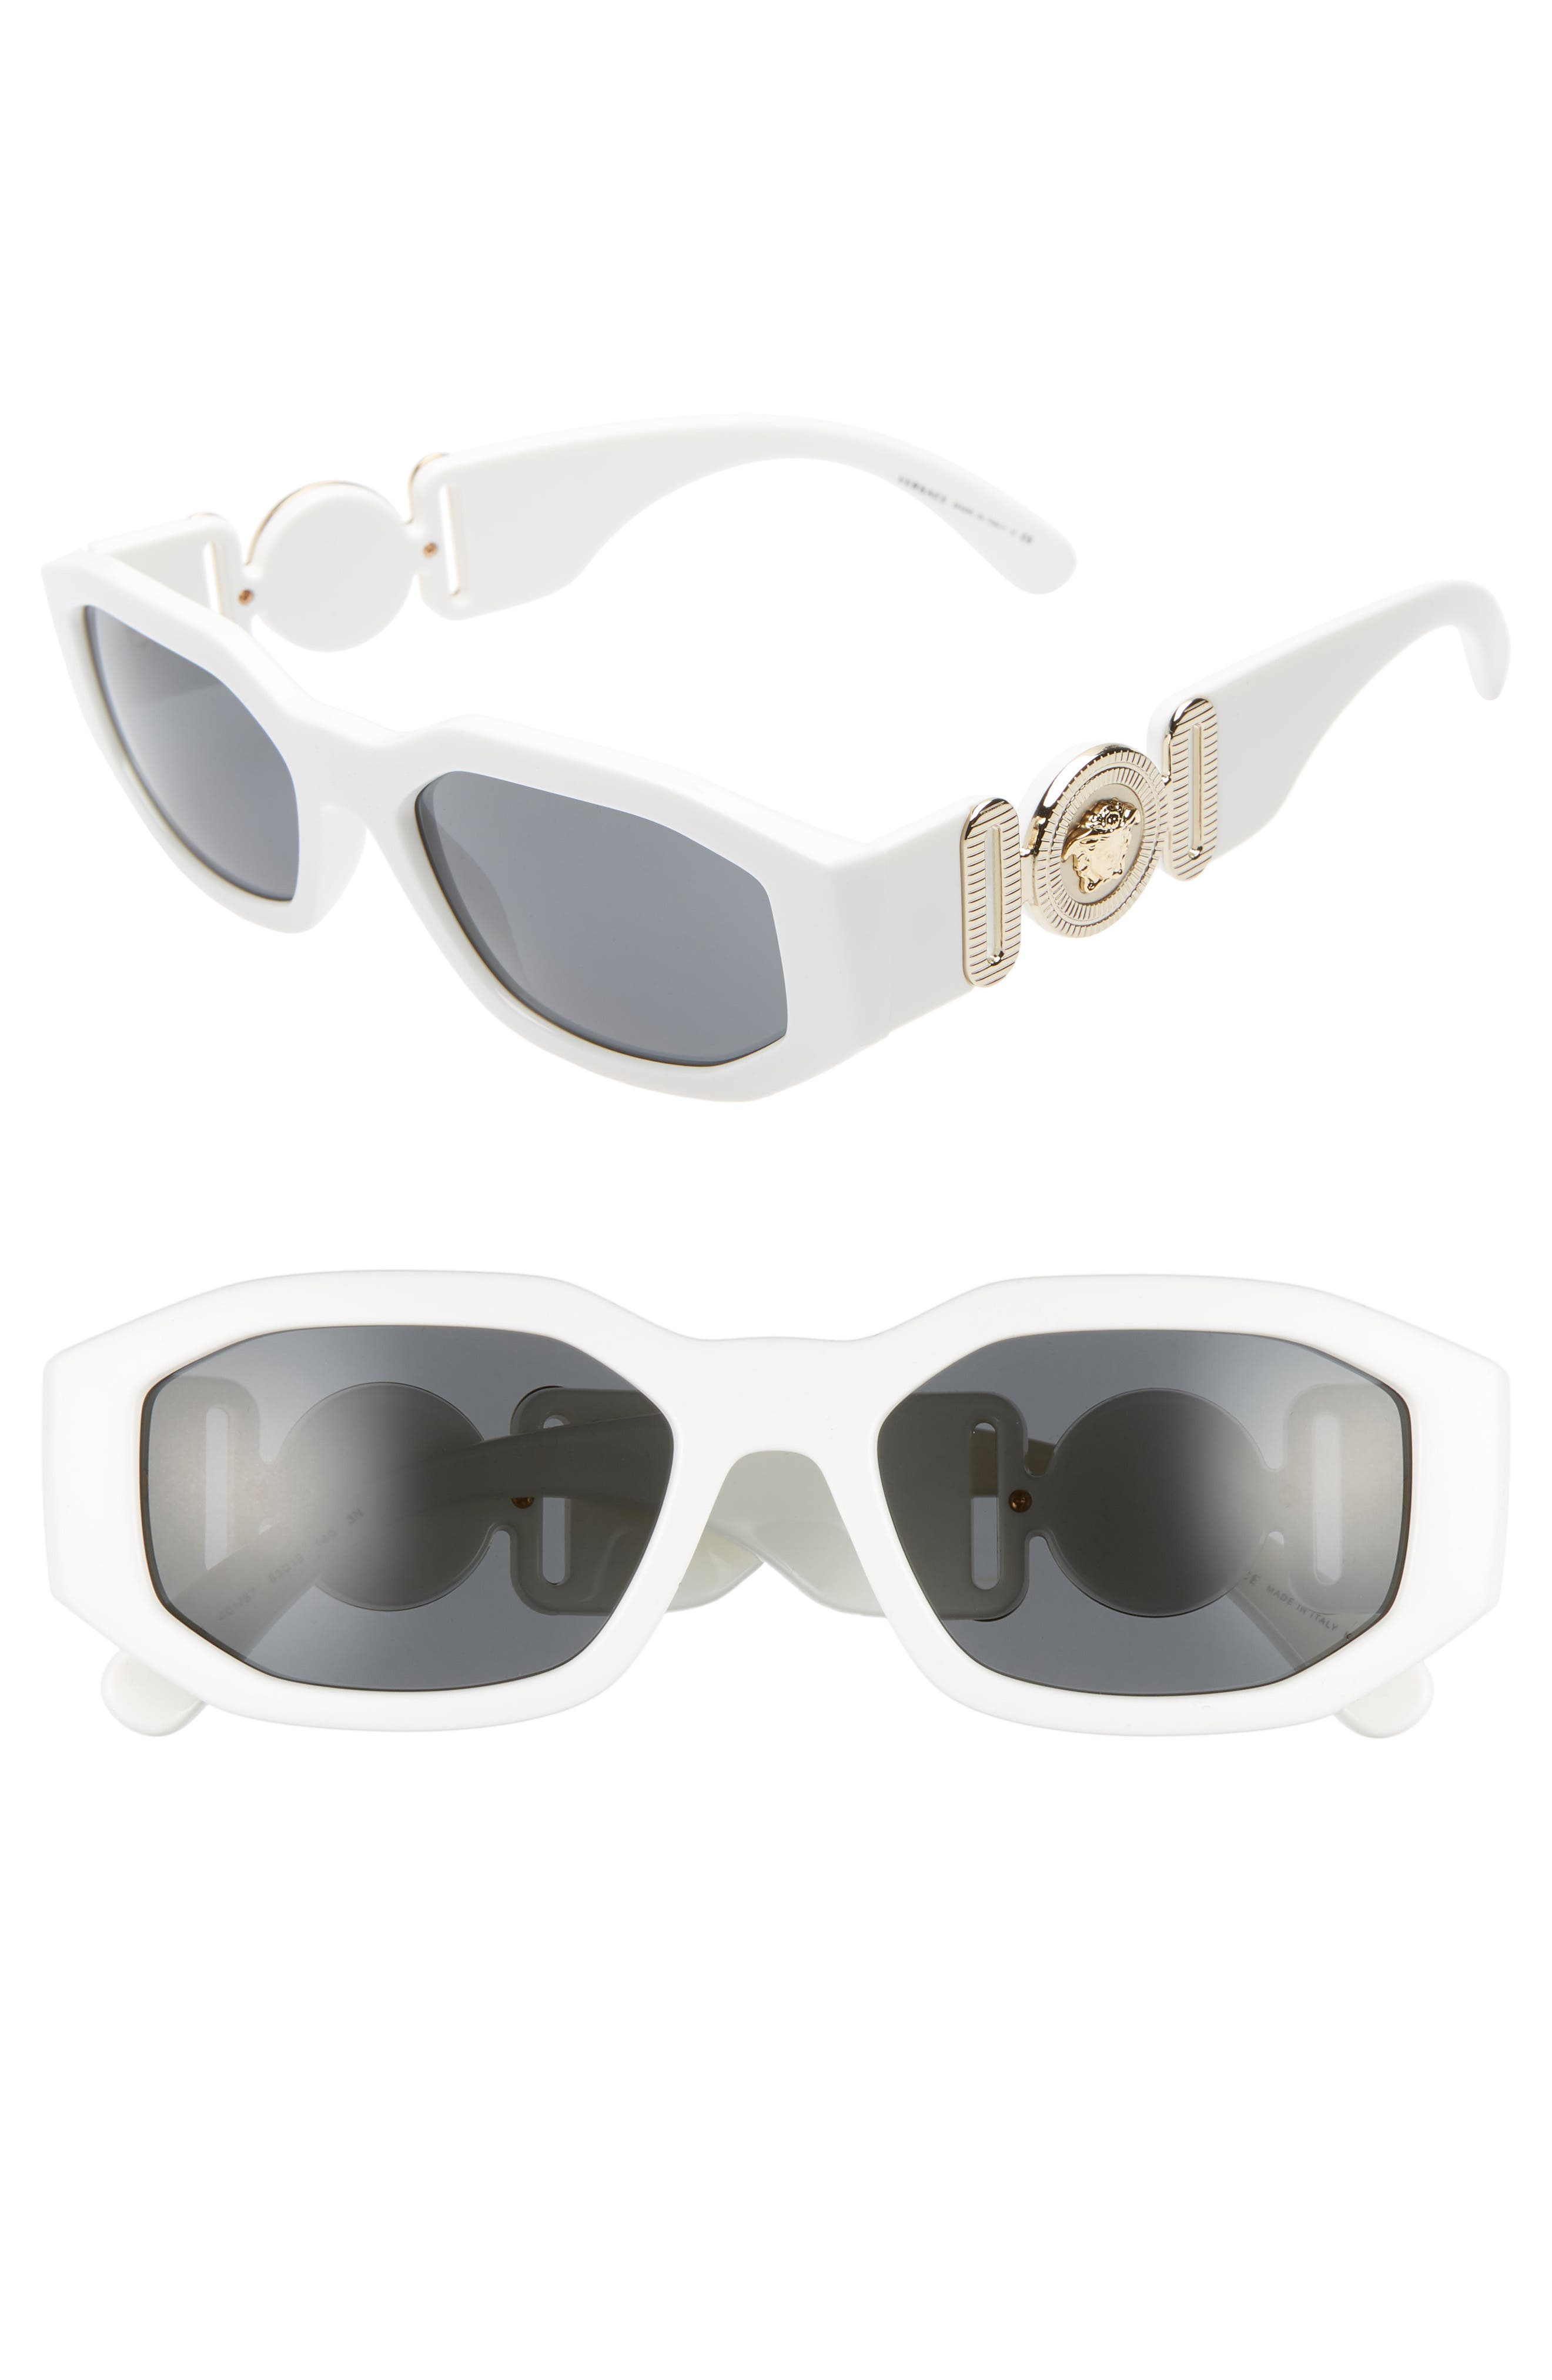 Eros sunglasses jewelry inc